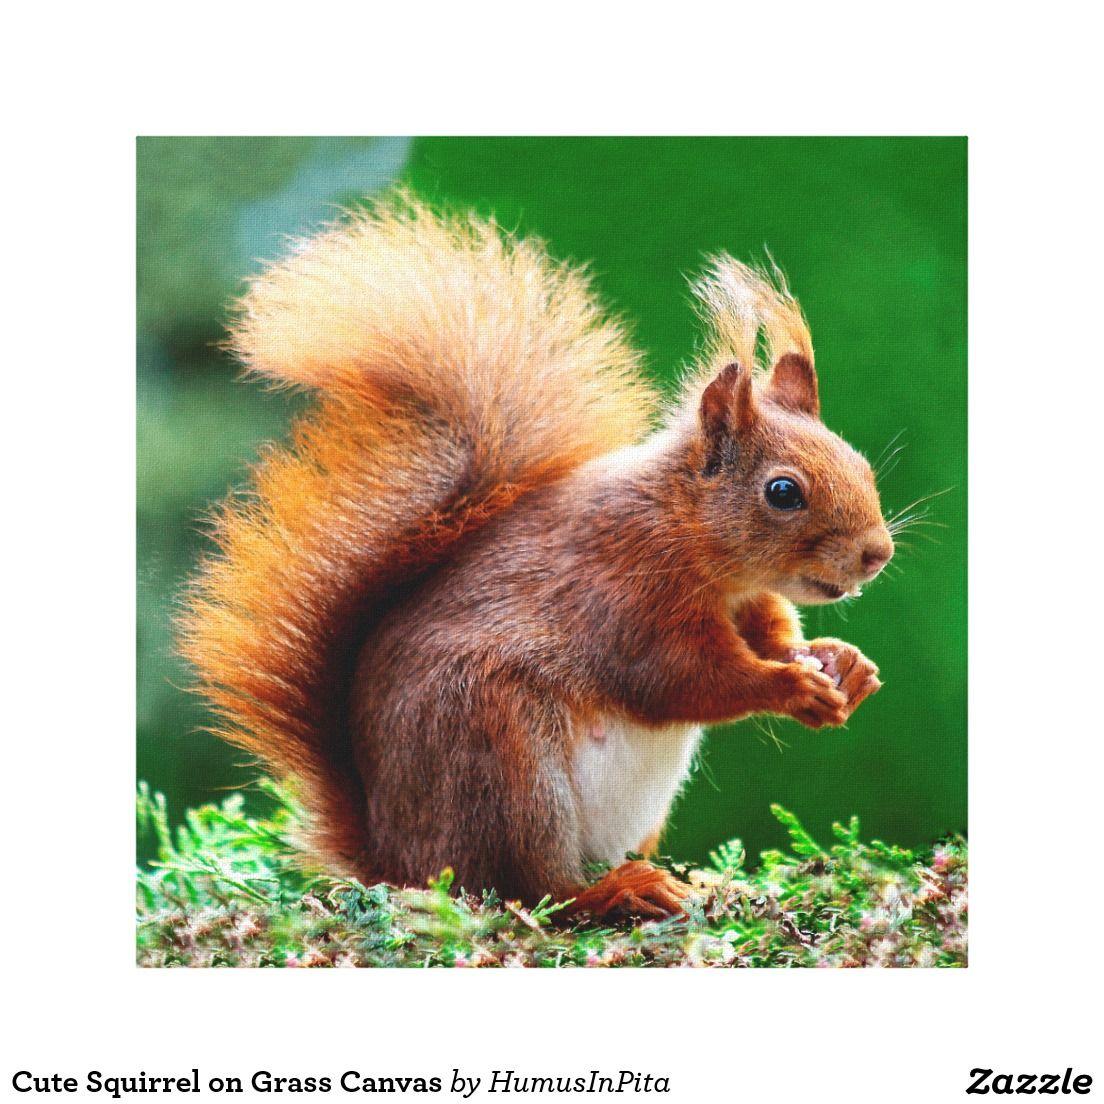 Cute Squirrel on Grass Canvas